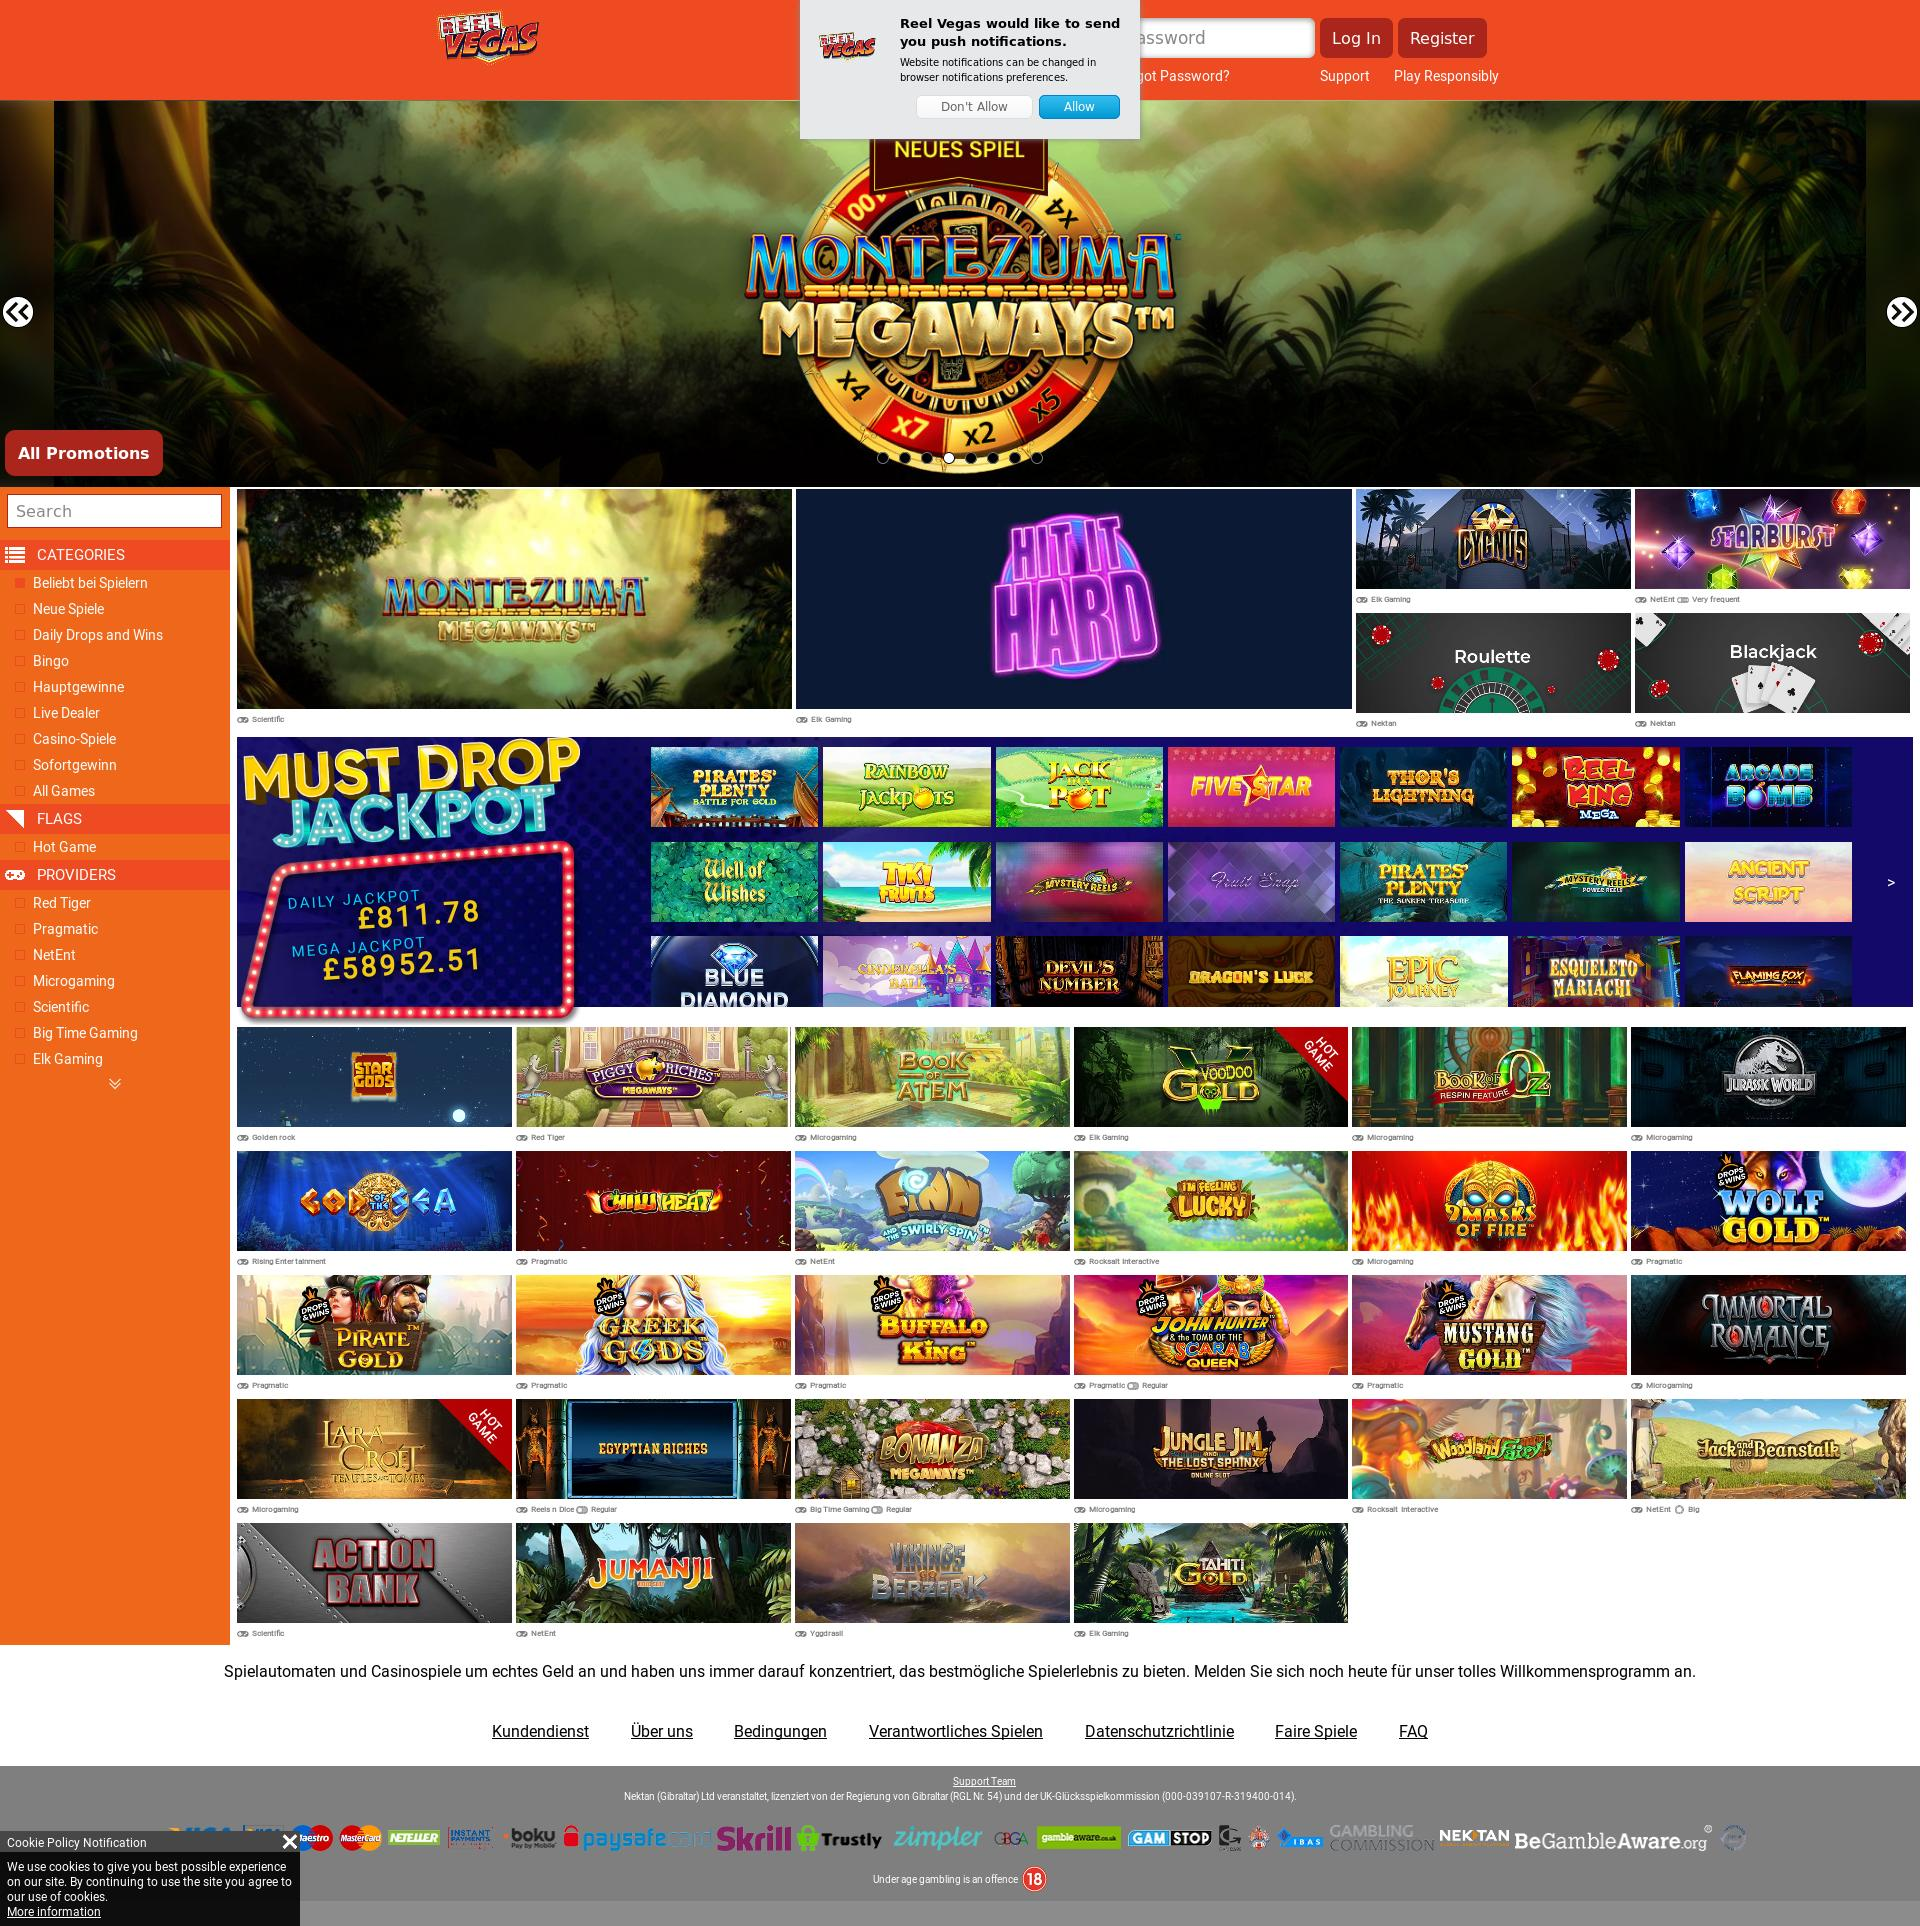 Casino screen Lobby 2020-01-24 for Germany